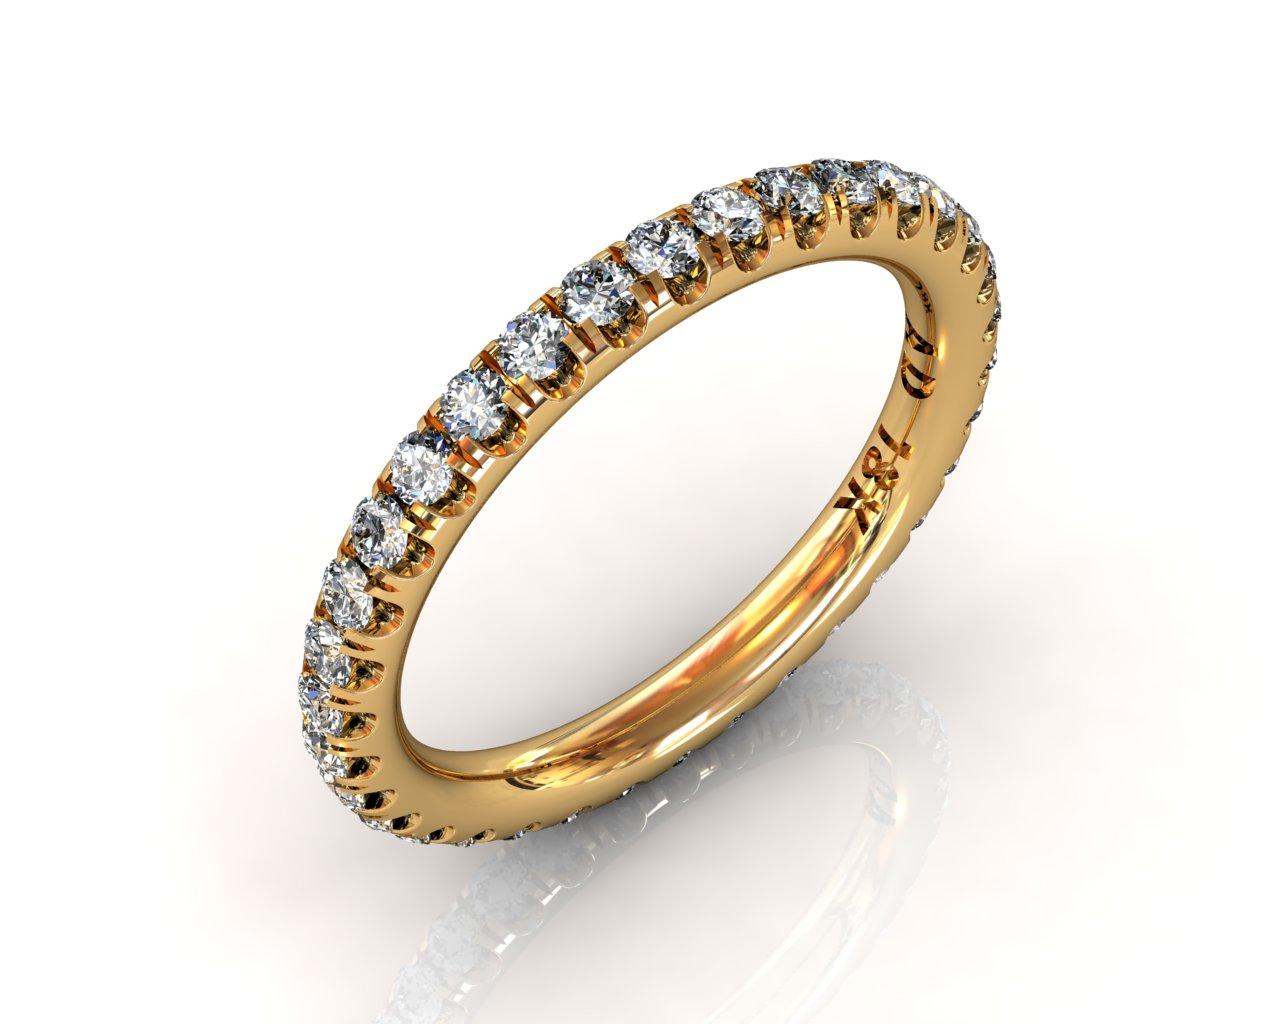 Wedding Bands Ladies Diamonds Craponia 24 Stone 0.74 TCW 3.0g 18kt Yellow Gold